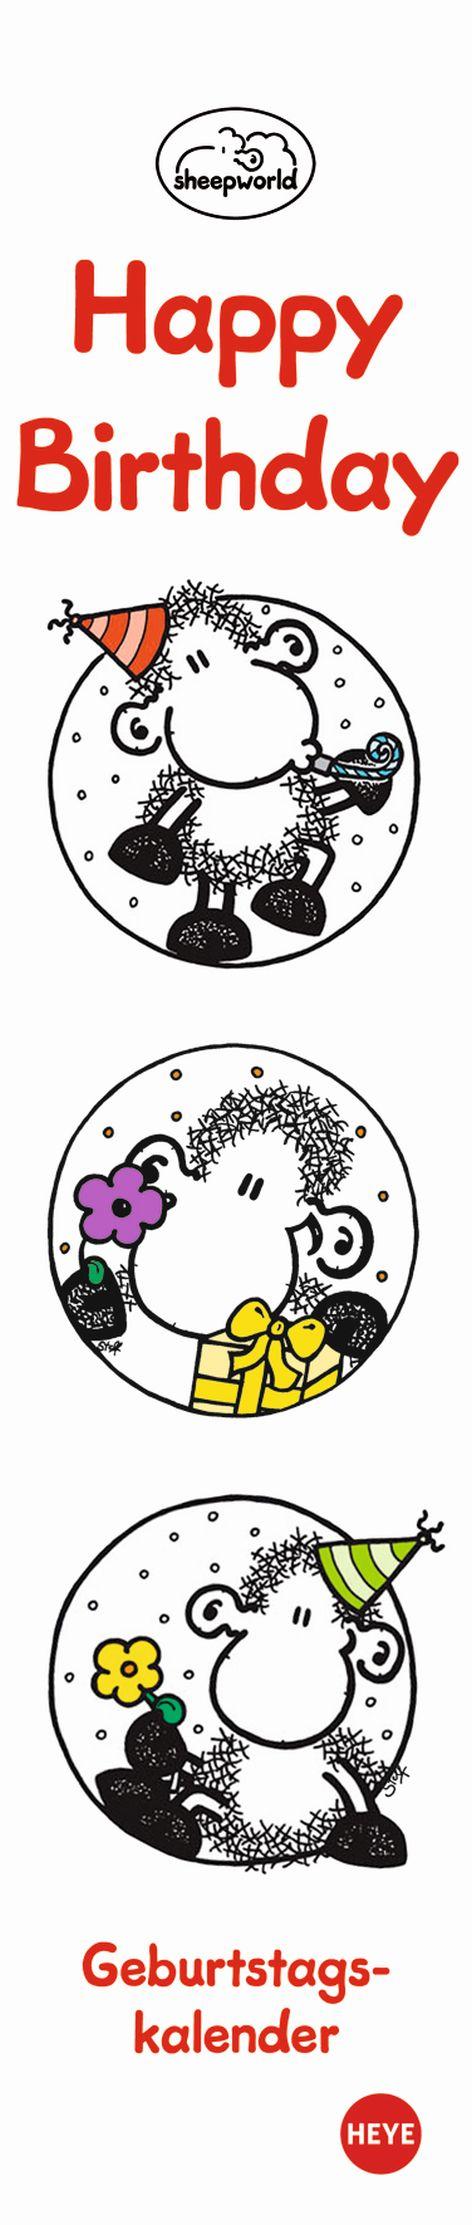 Geburtstagskalender Sheepworld 7x33cm jahresunabhängig